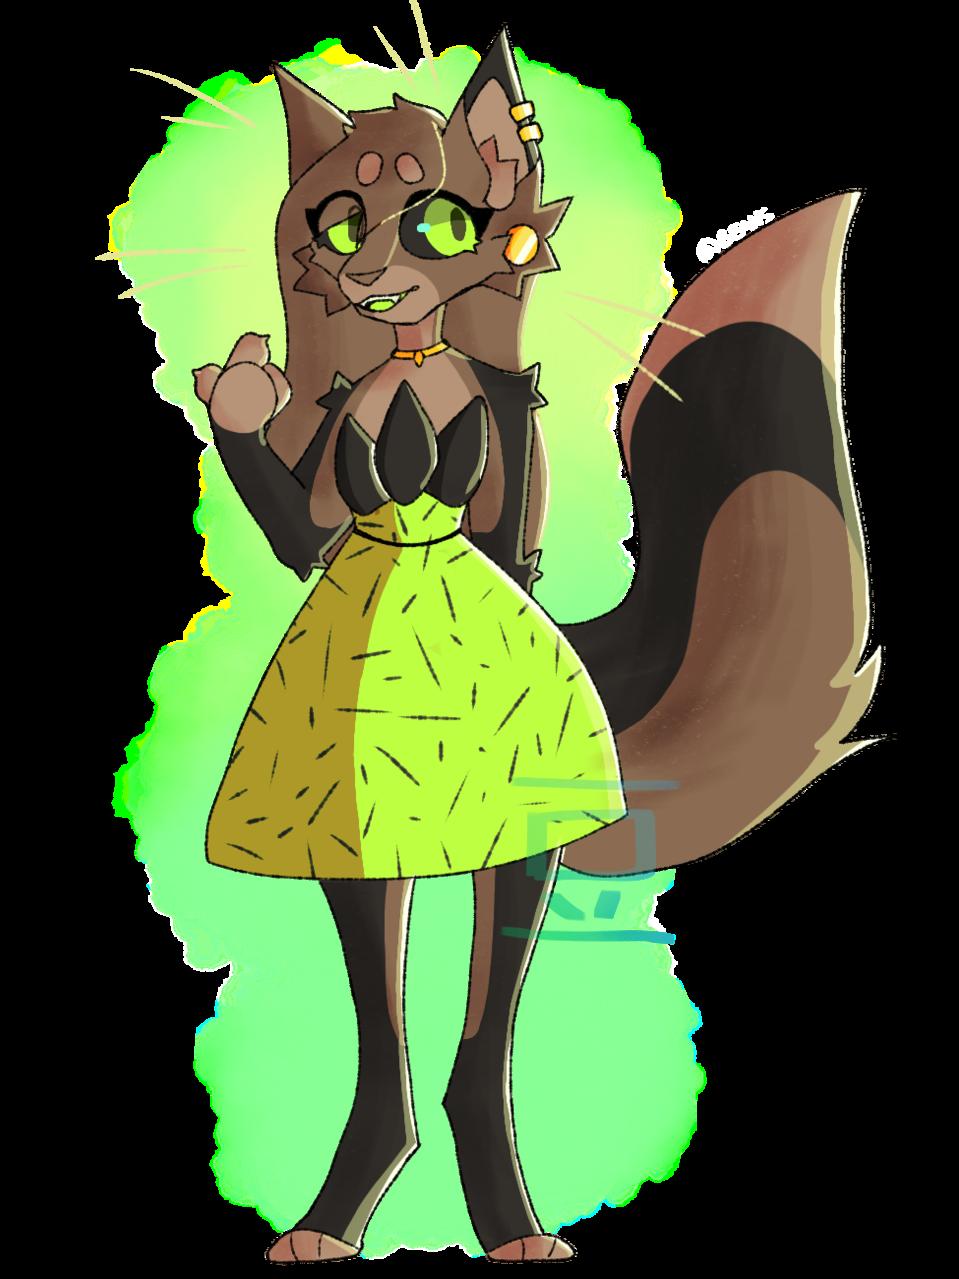 Kiwi (raffle adopt from BBO) Illust of 💚beans💙 furry oc adopt